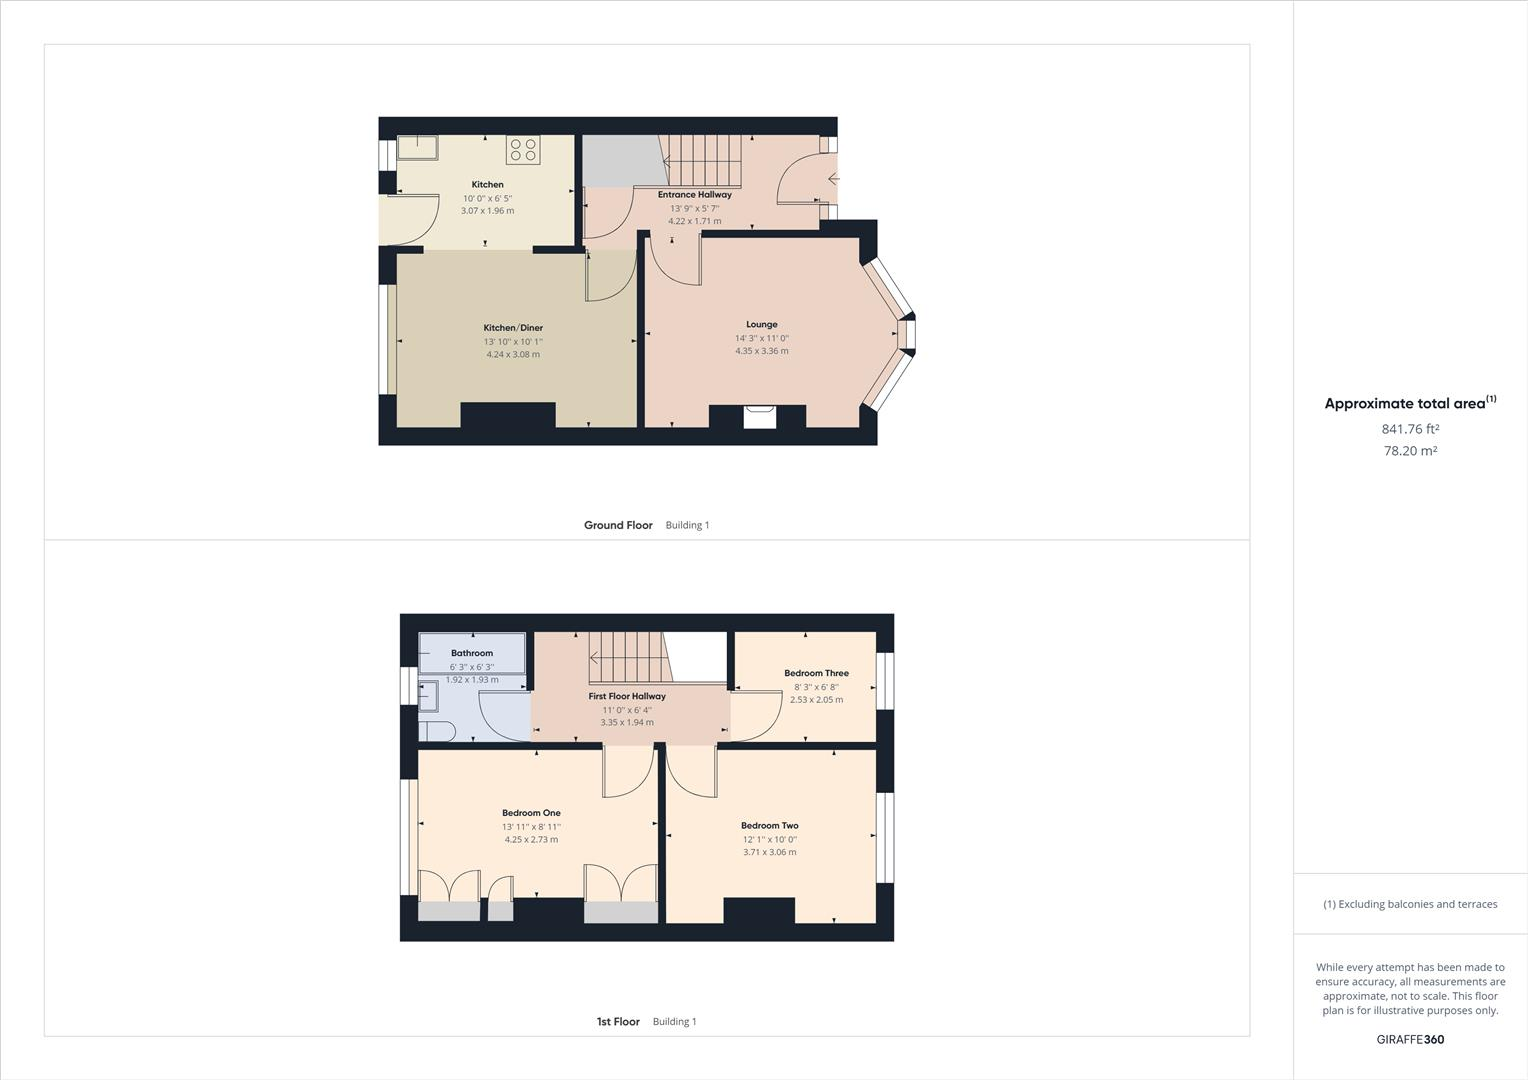 floorplan01_ALL.png